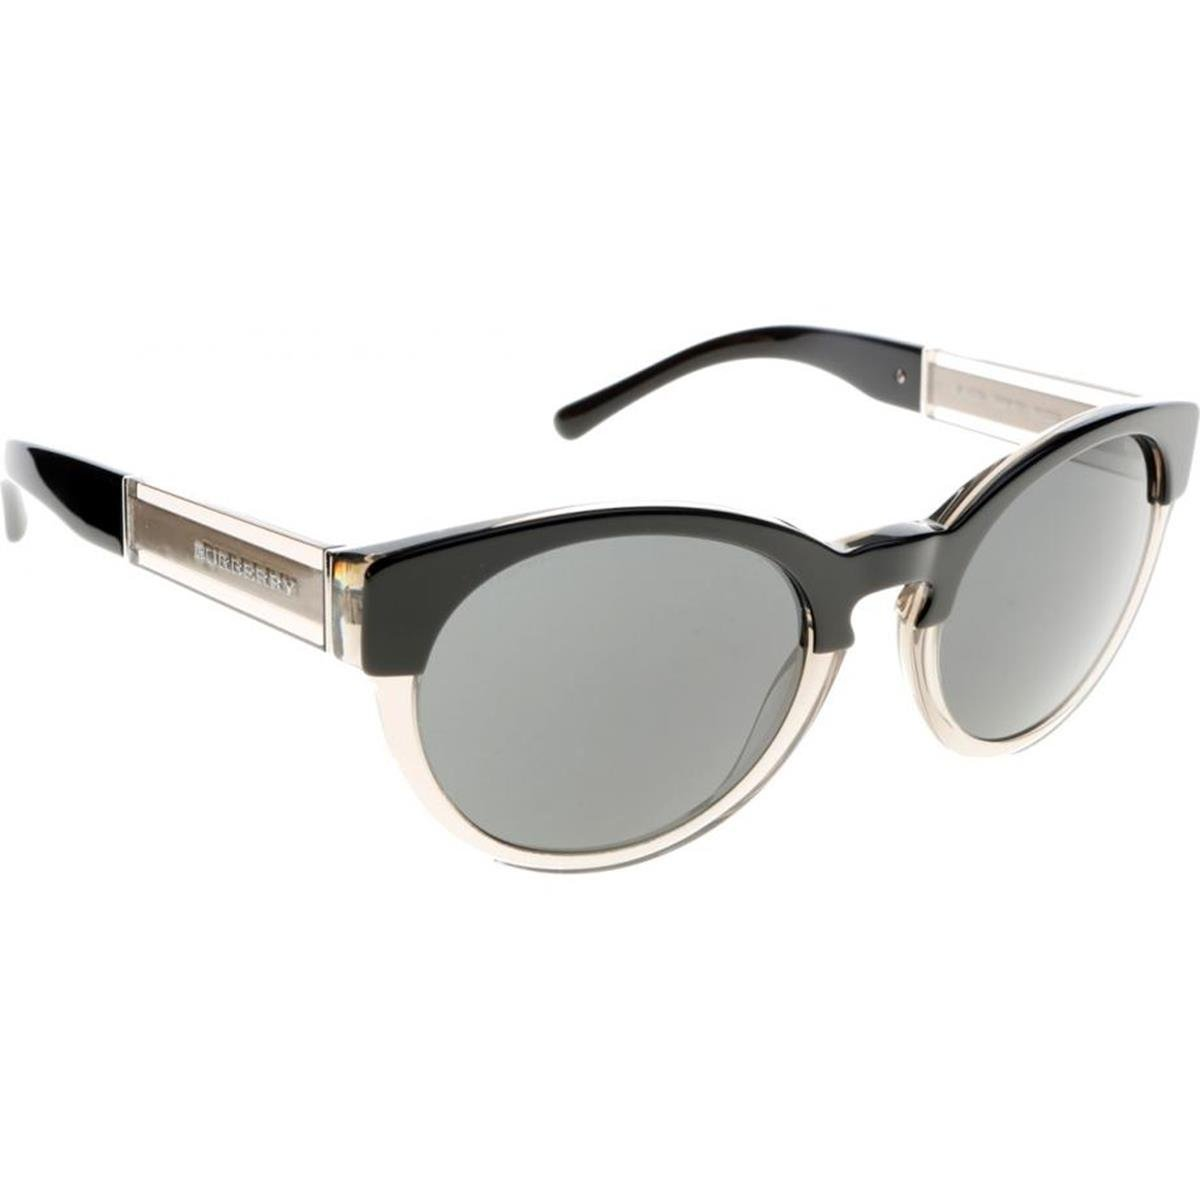 Burberry Gafas de Sol Unisex Adulto